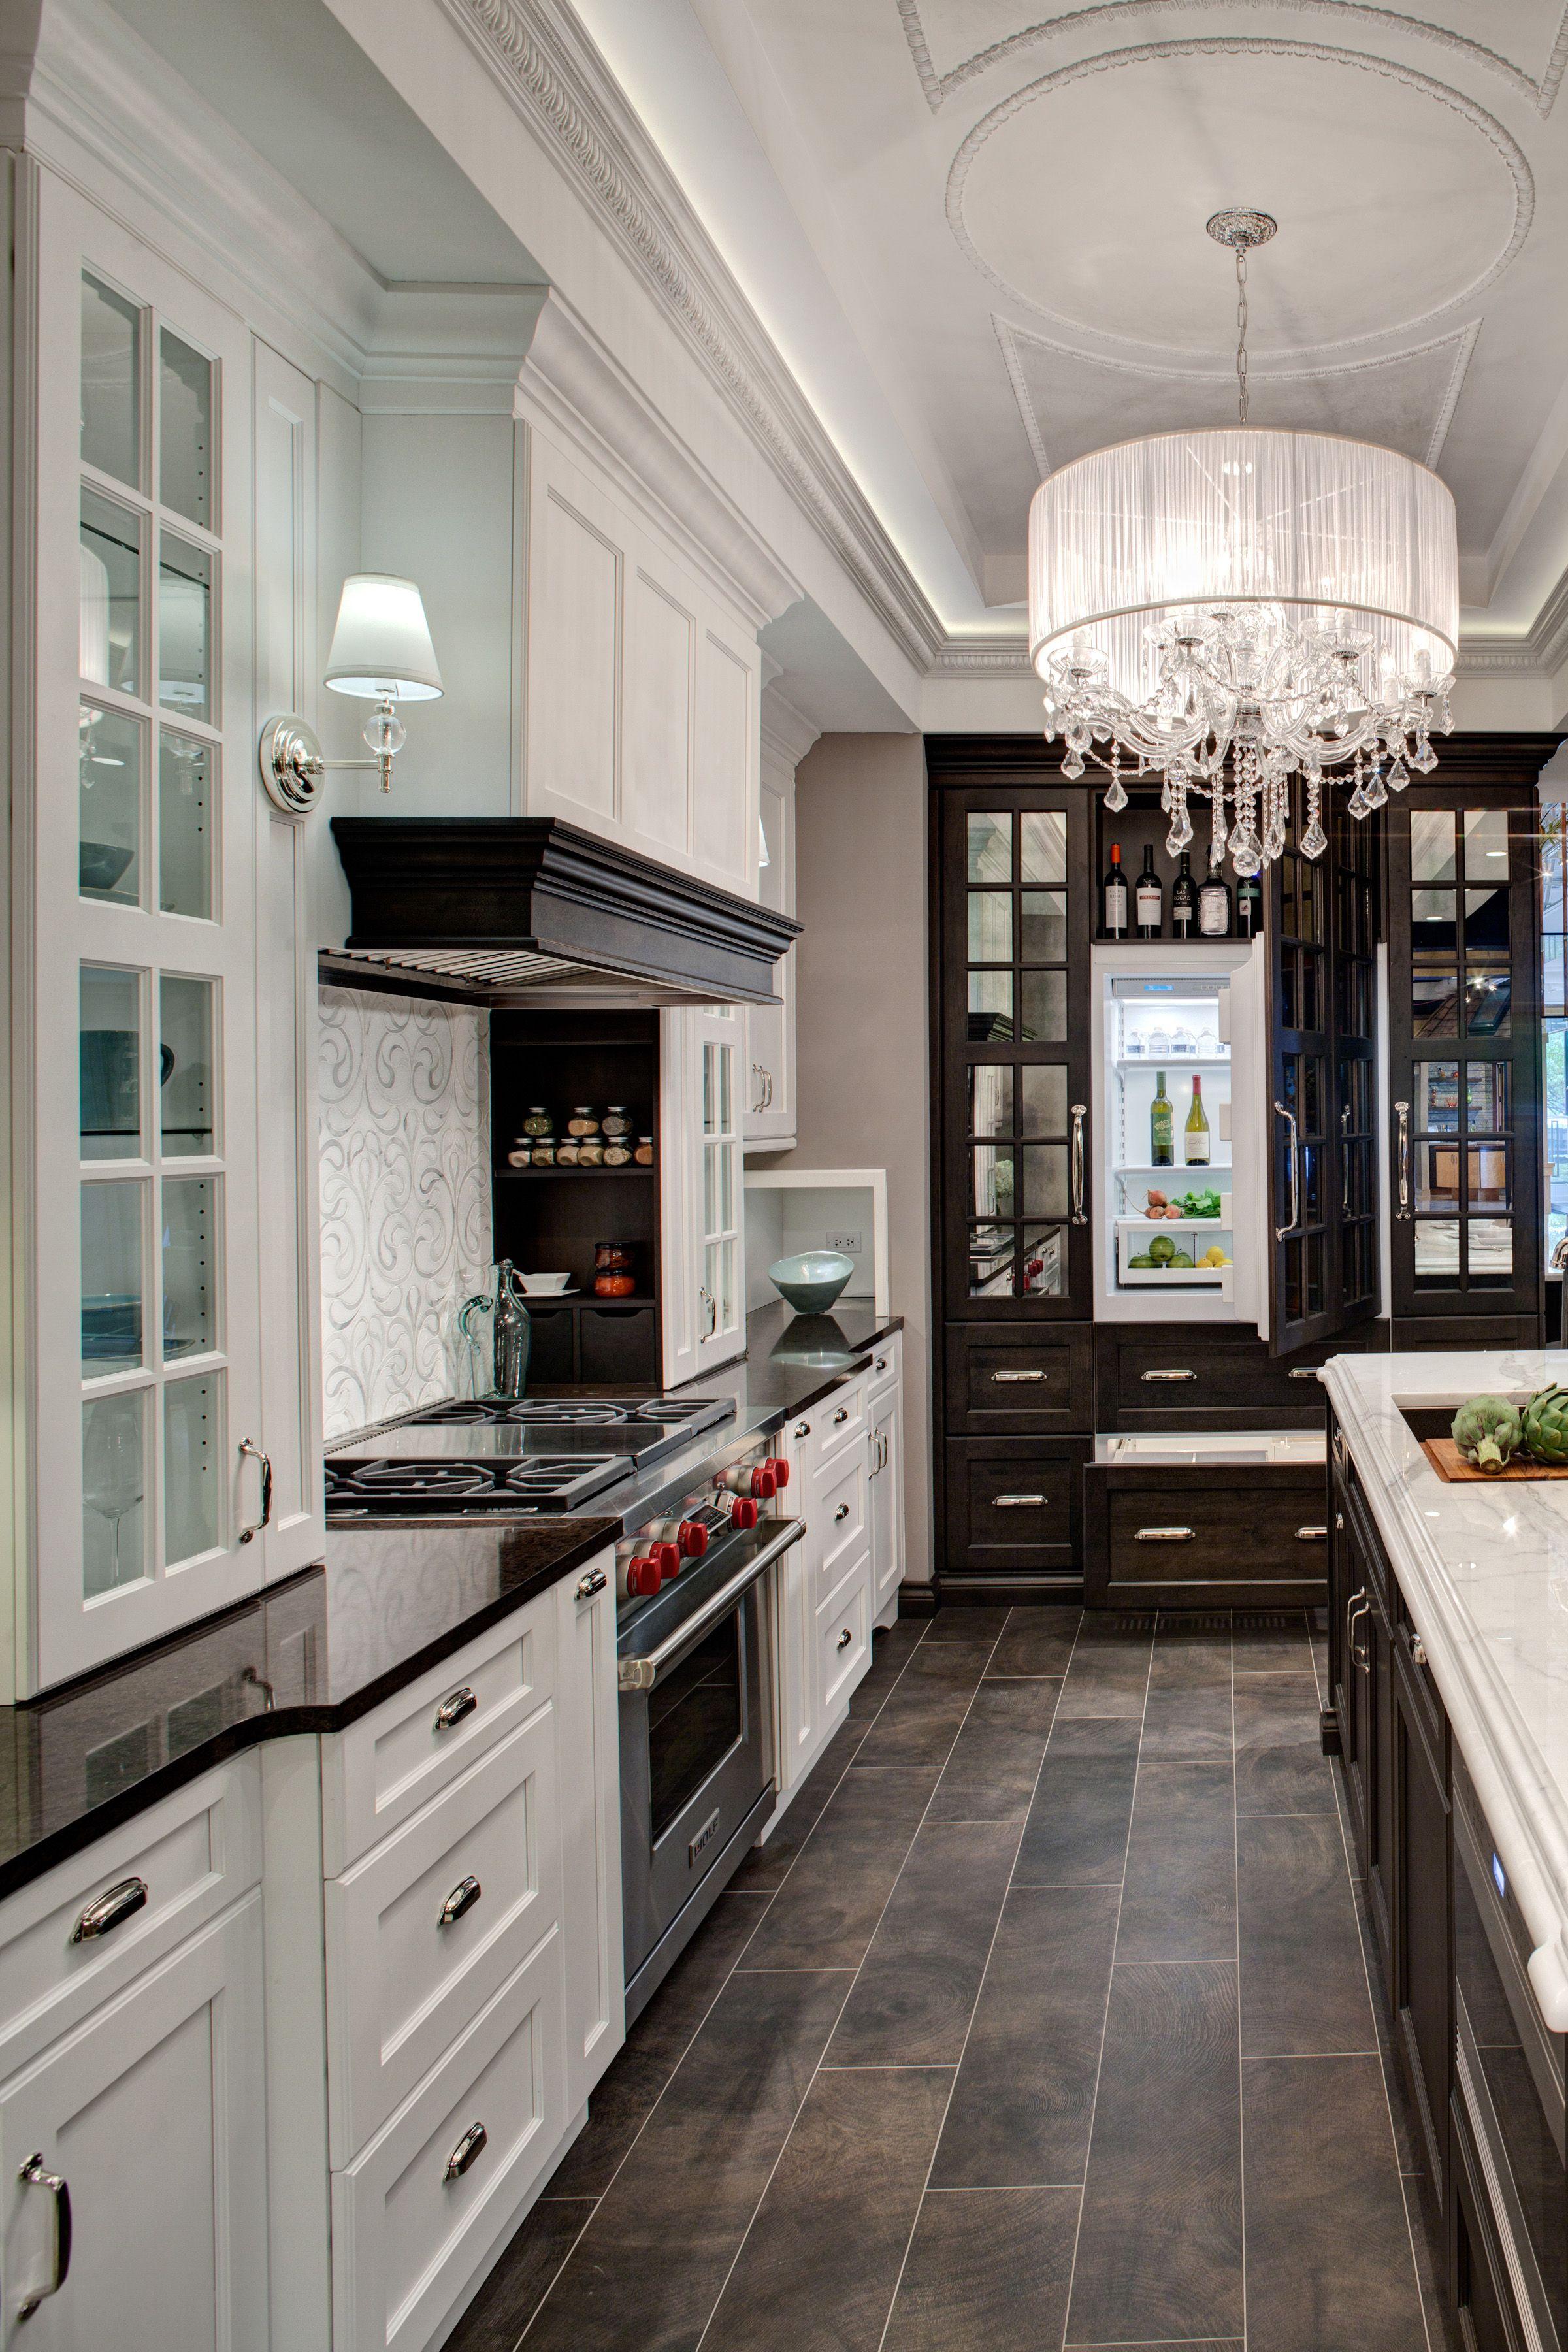 Lincolnwood design showroom kitchen display decoracion casa